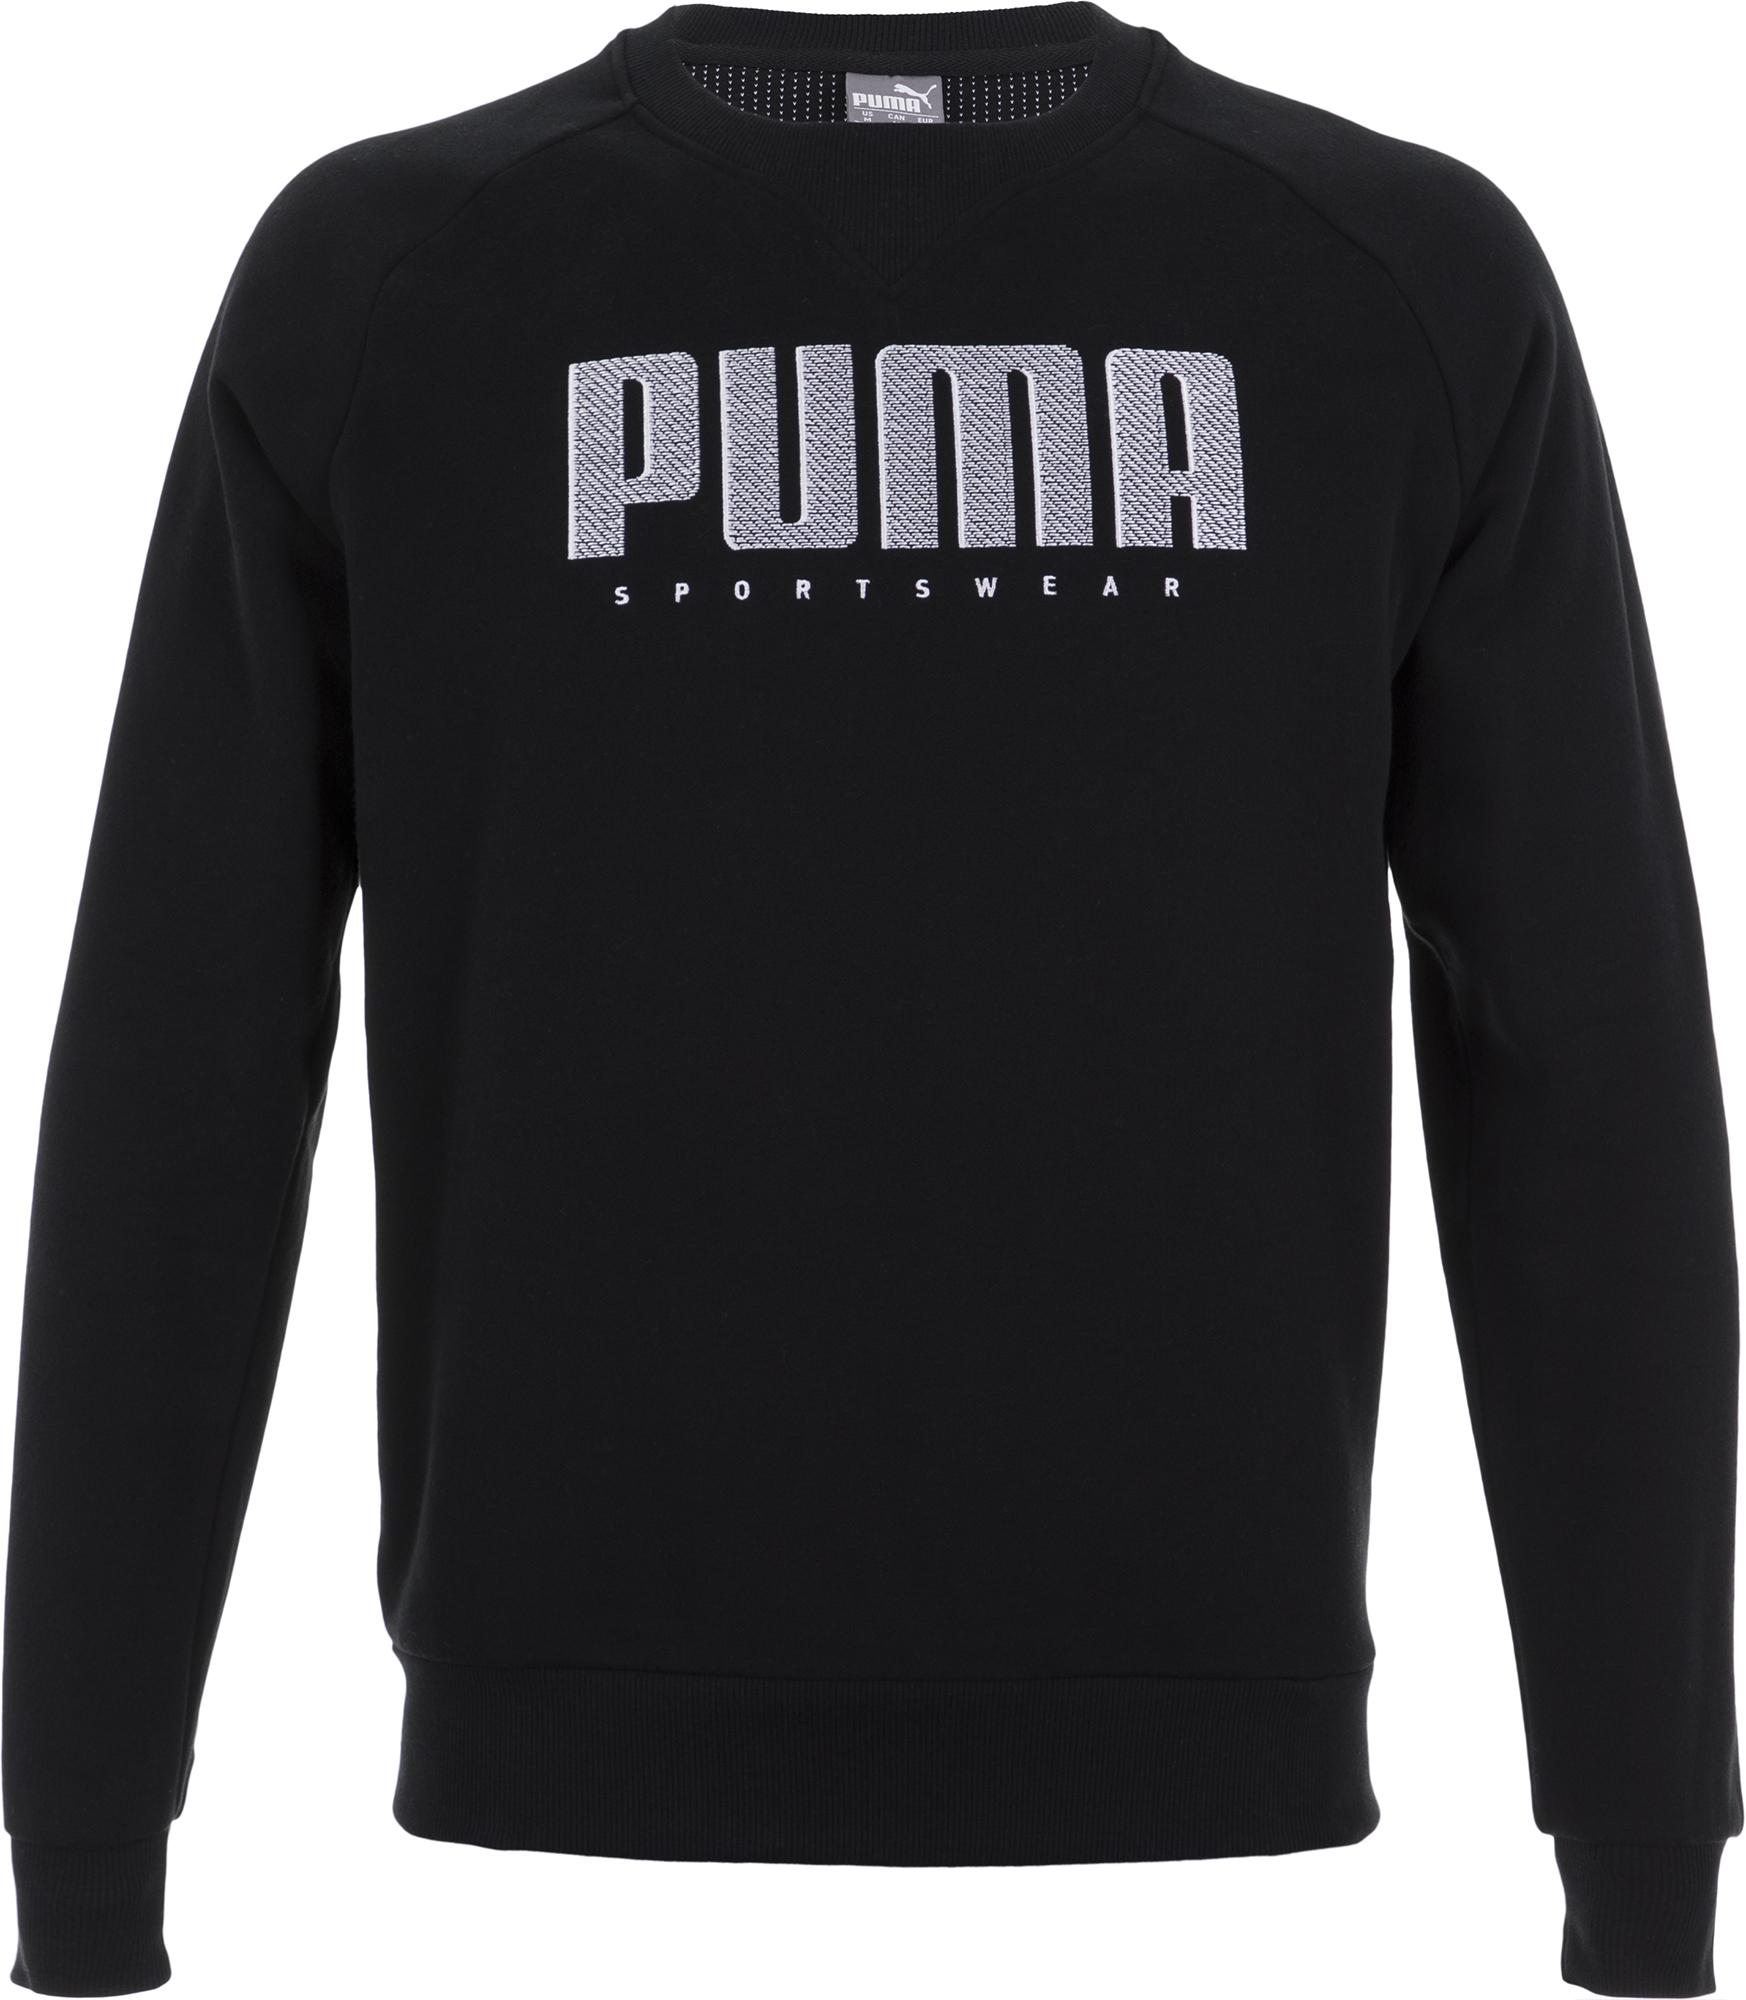 Puma Свитшот мужской Puma Athletics Crew, размер 50-52 цены онлайн